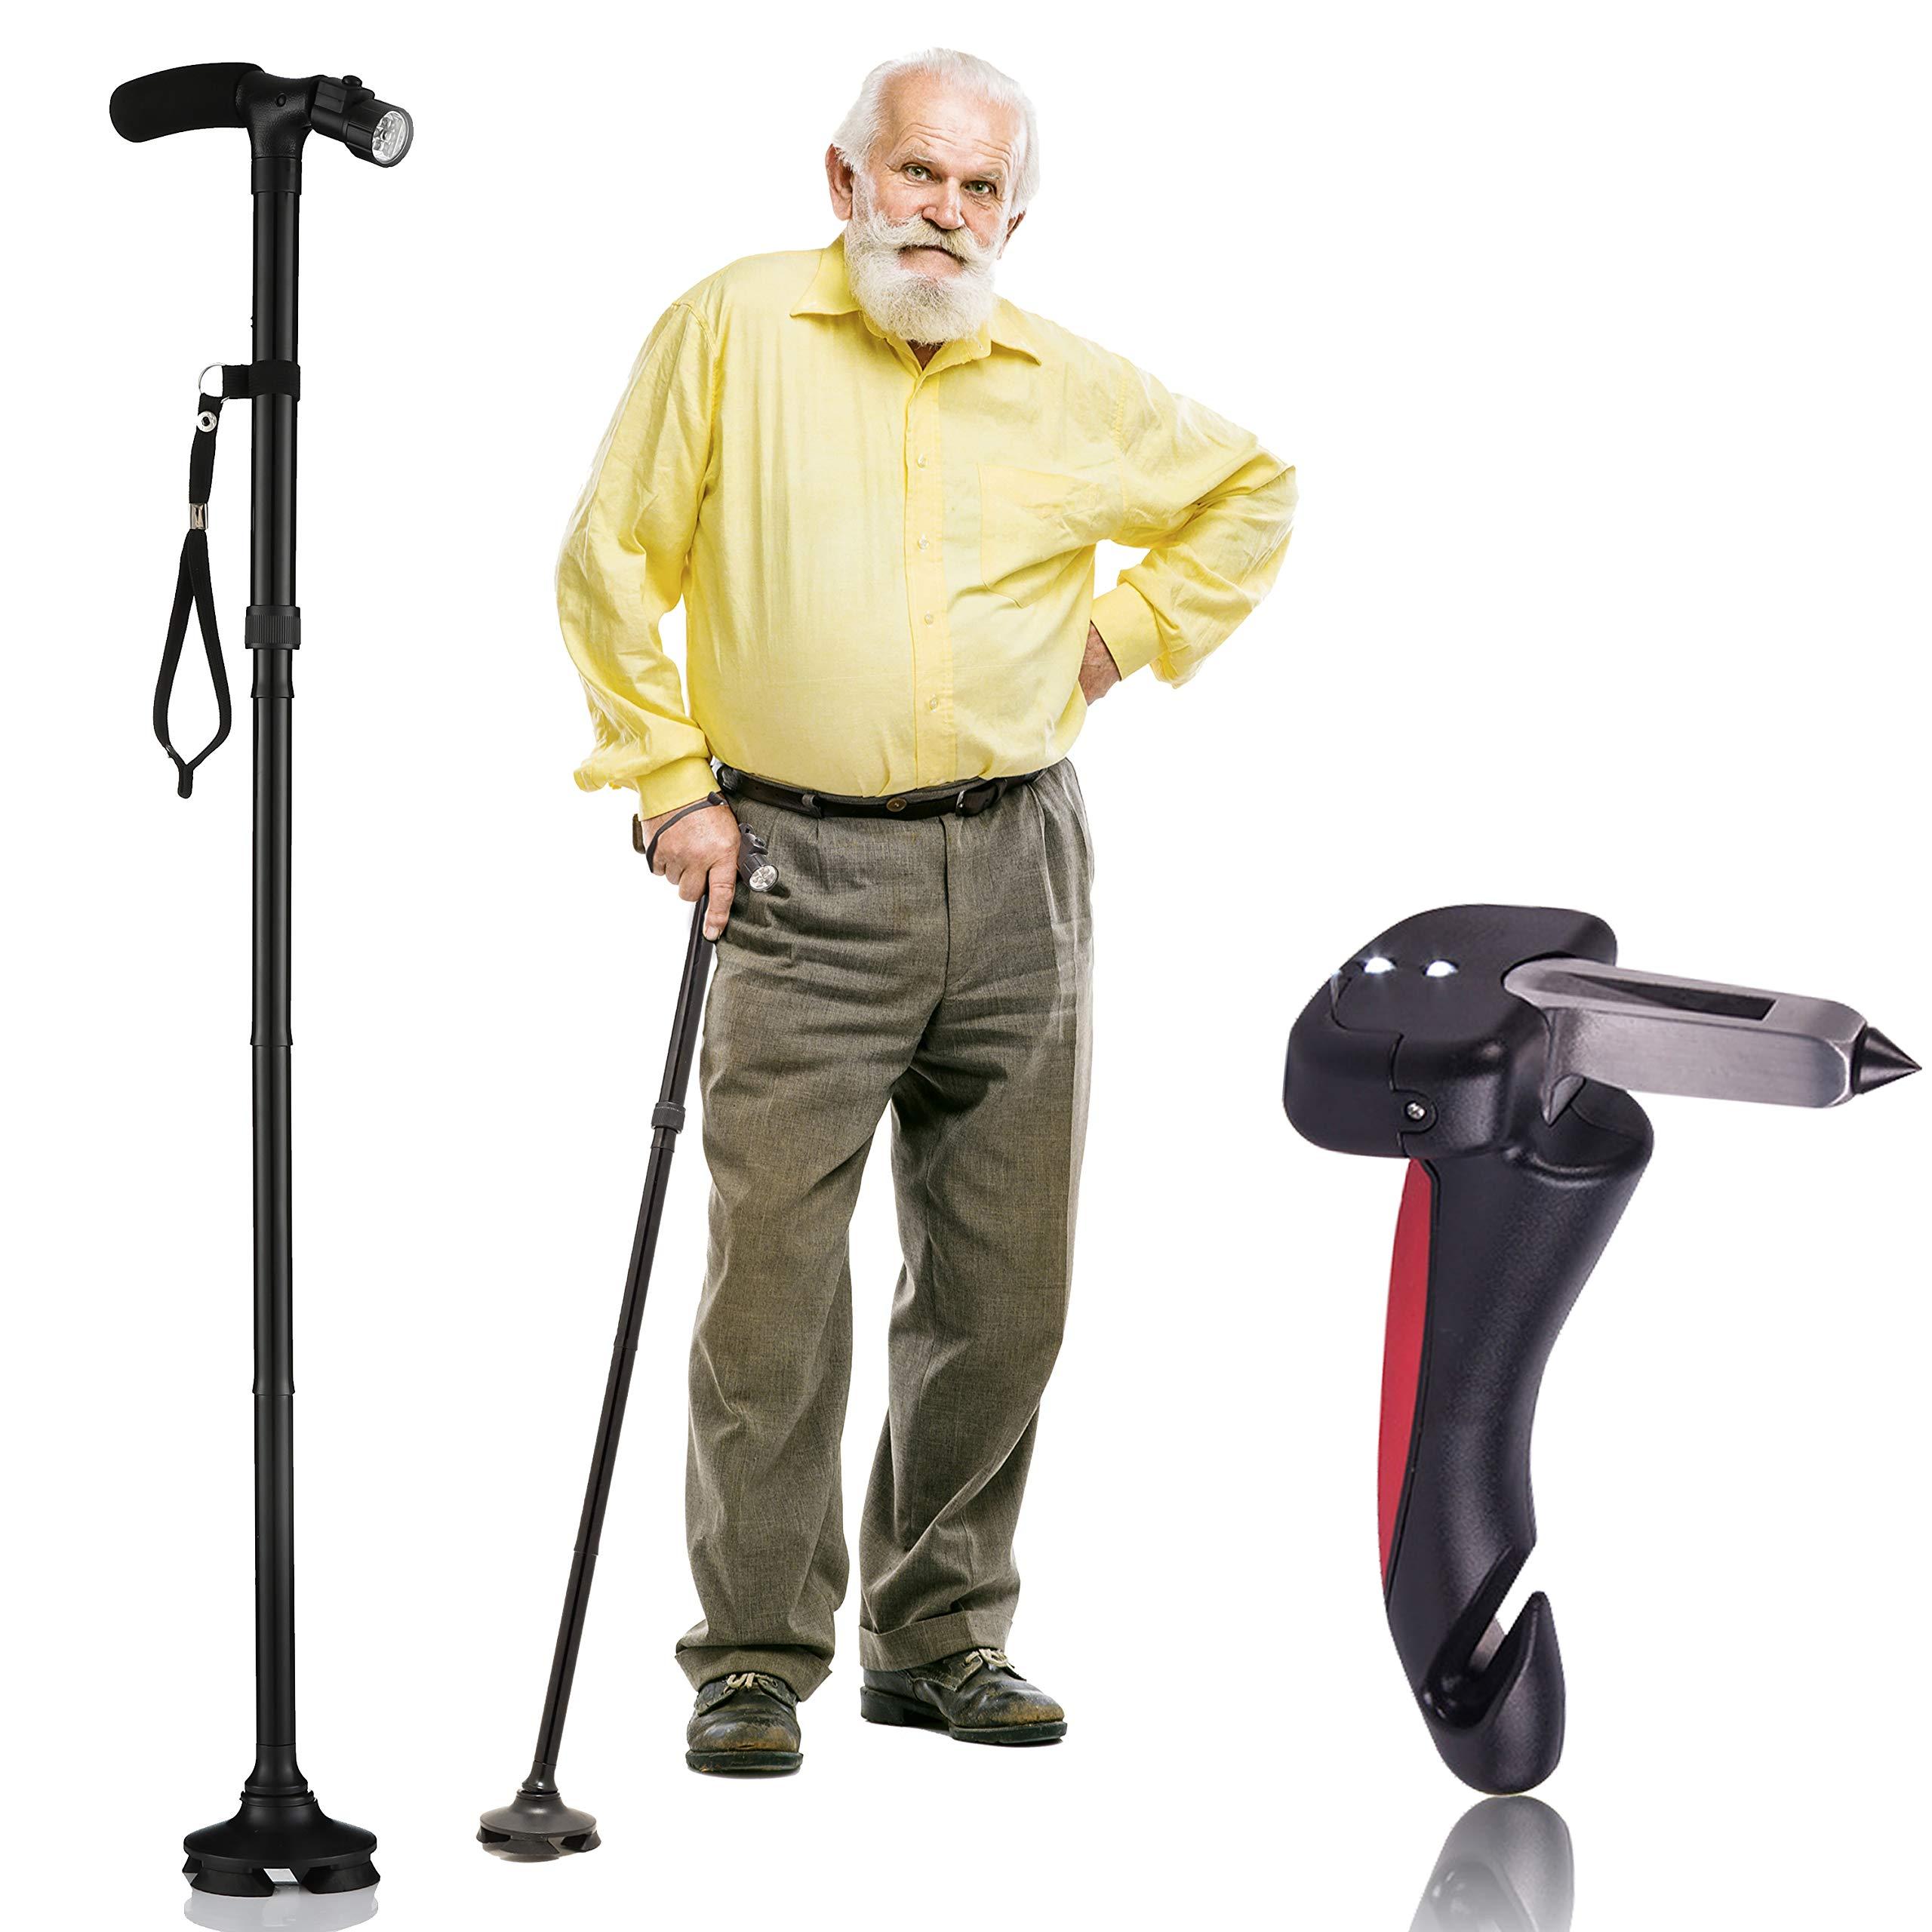 Walking Cane by Dr. Maya with Free Car Cane, Tips & LED Lights - Lightweight, Adjustable, Foldable, Pivoting Base, Quad Travel Balance Stick Support for Elderly Men and Women - Walker for Seniors!